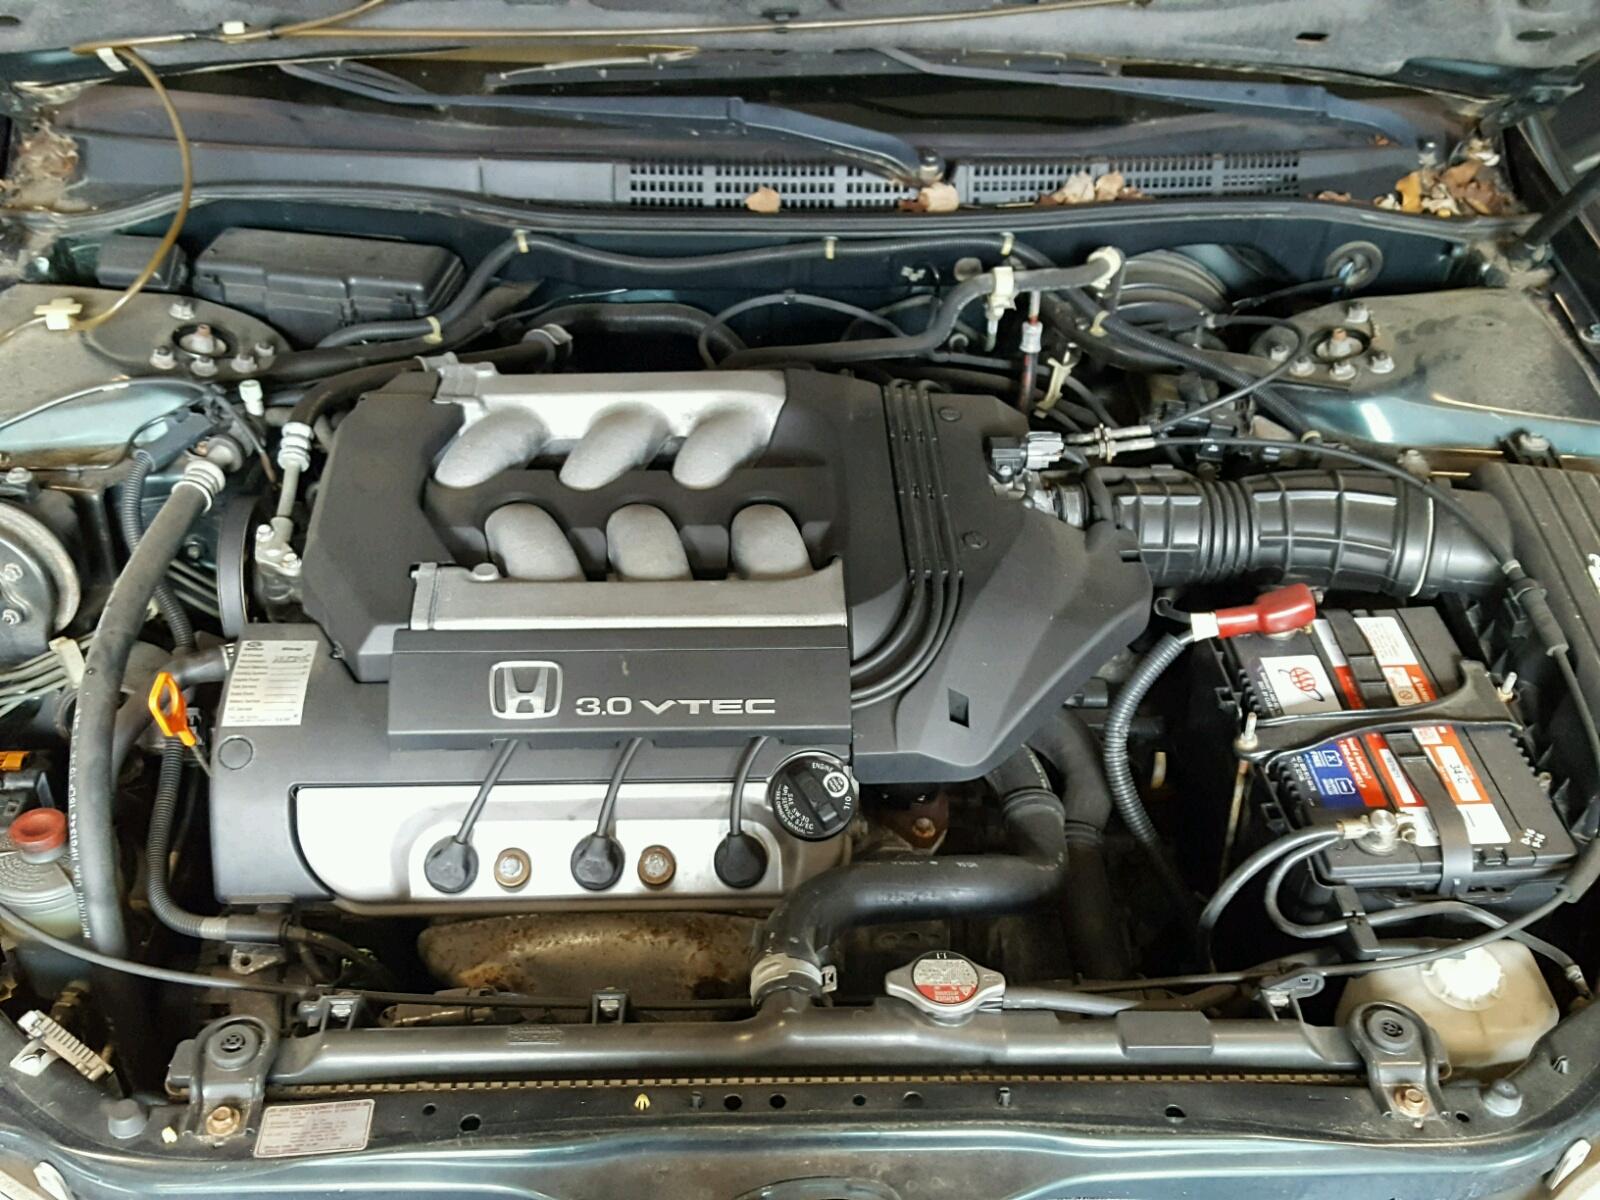 1hgcg1654xa016371 1999 Green Honda Accord Ex On Sale In Va Vtec Engine 30l Inside View